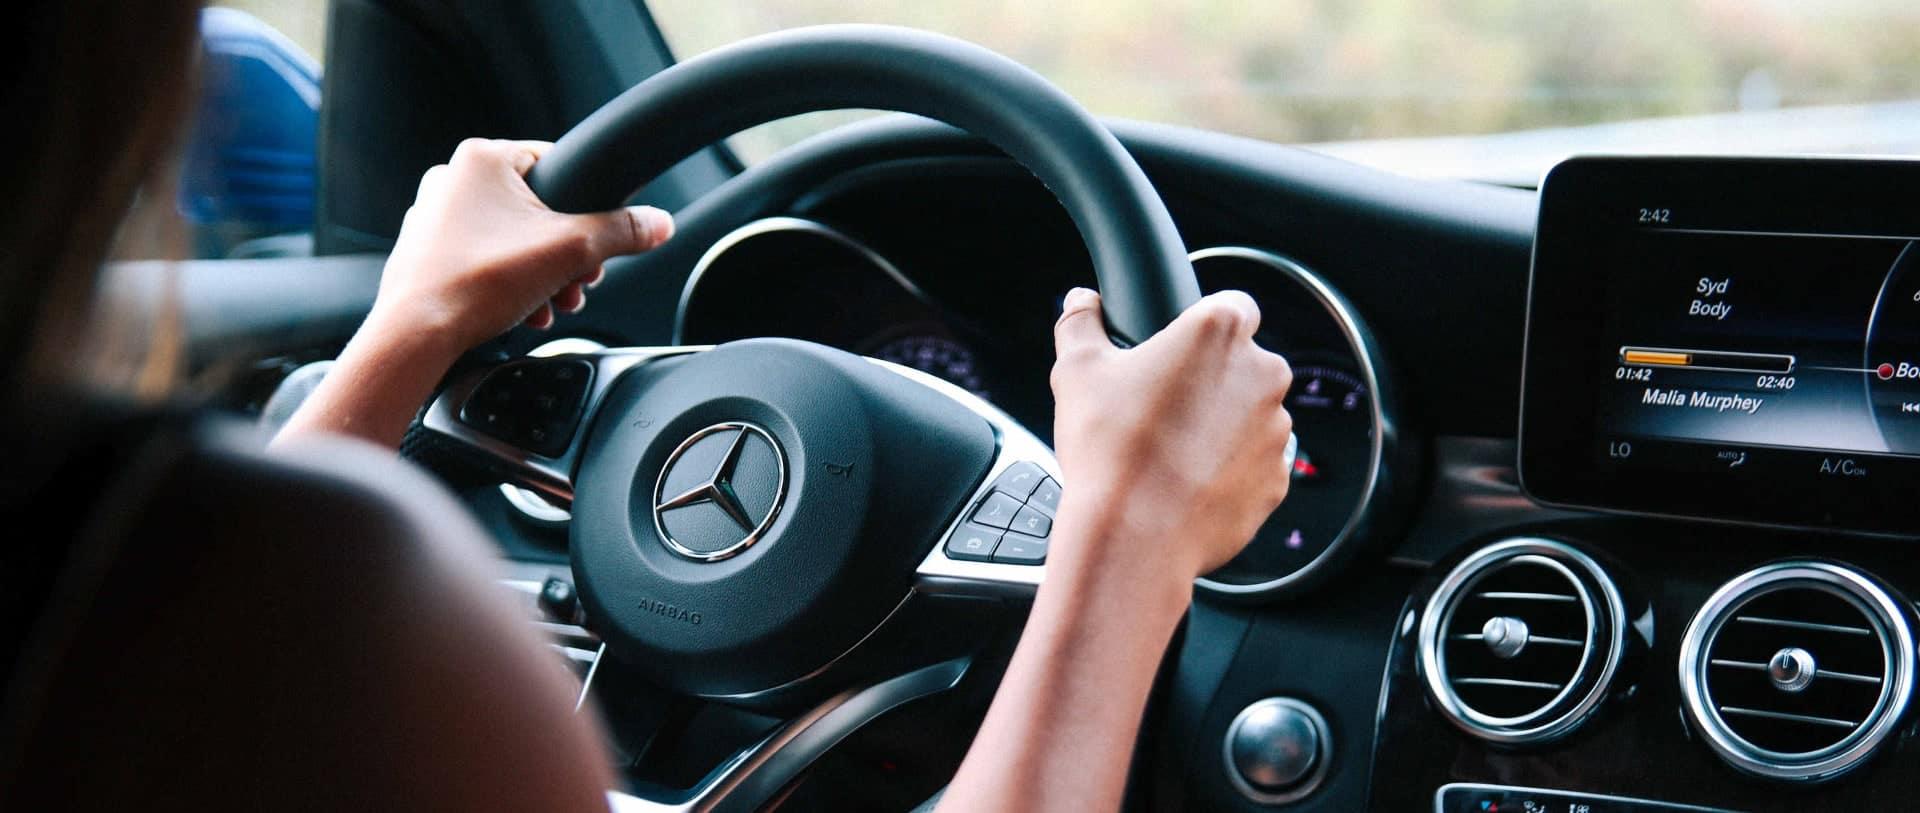 Mercedes Service A5